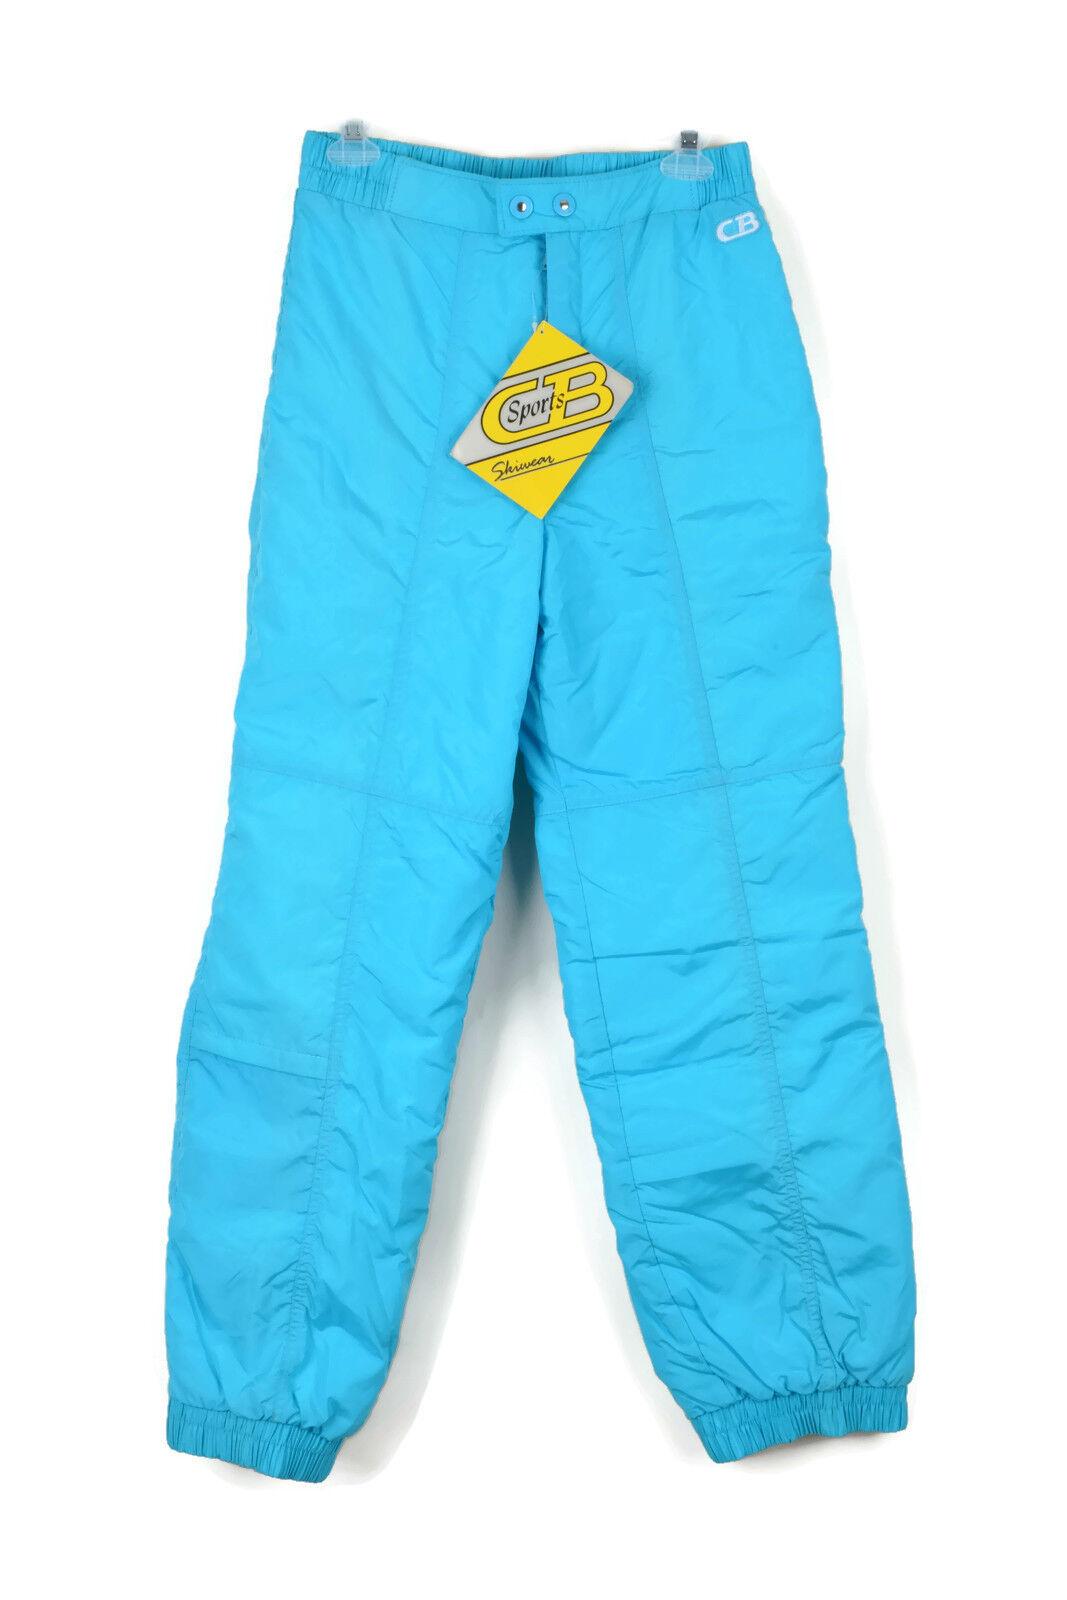 Vintage 80s CB Sports Skiwear Womens bluee Insulated Nylon Ski Snow Pants Sz 12